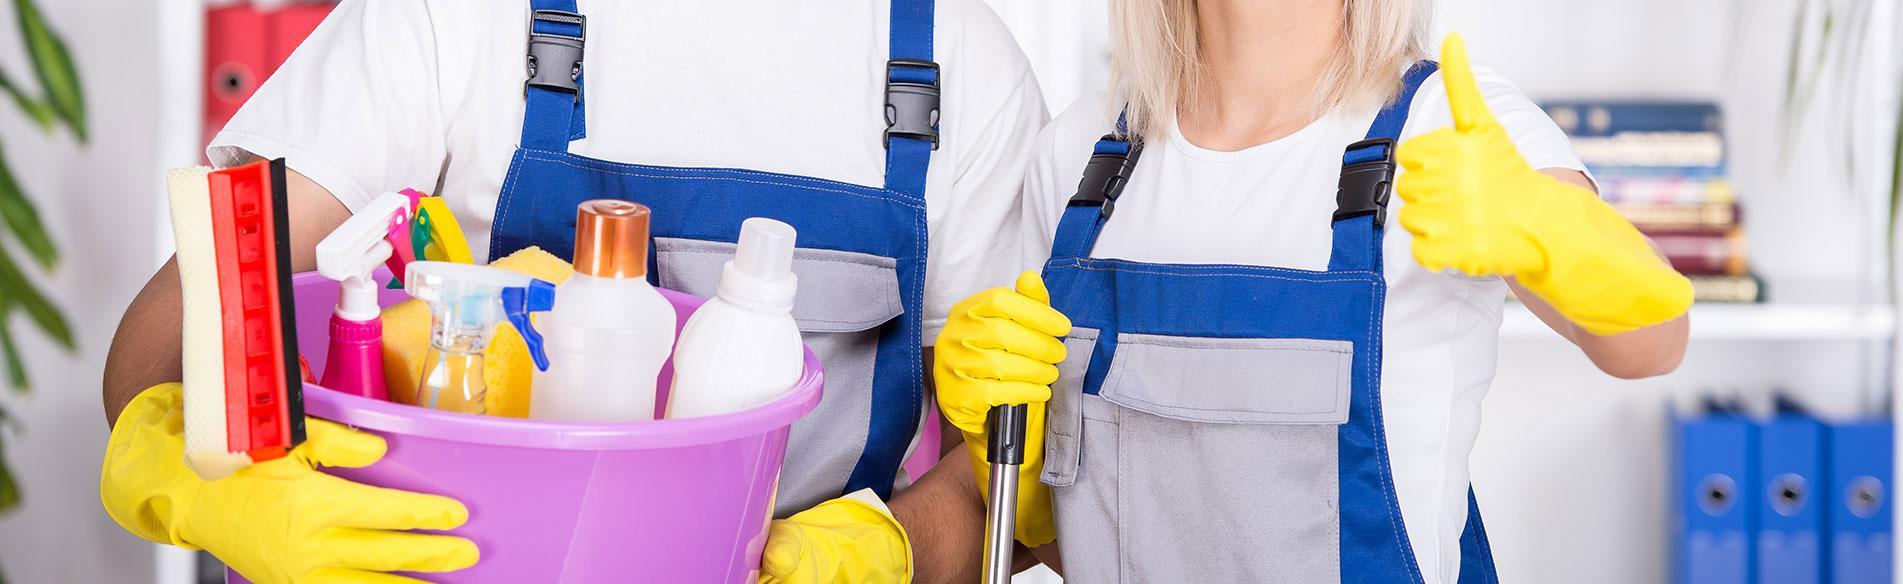 Maida Vale Cleaners